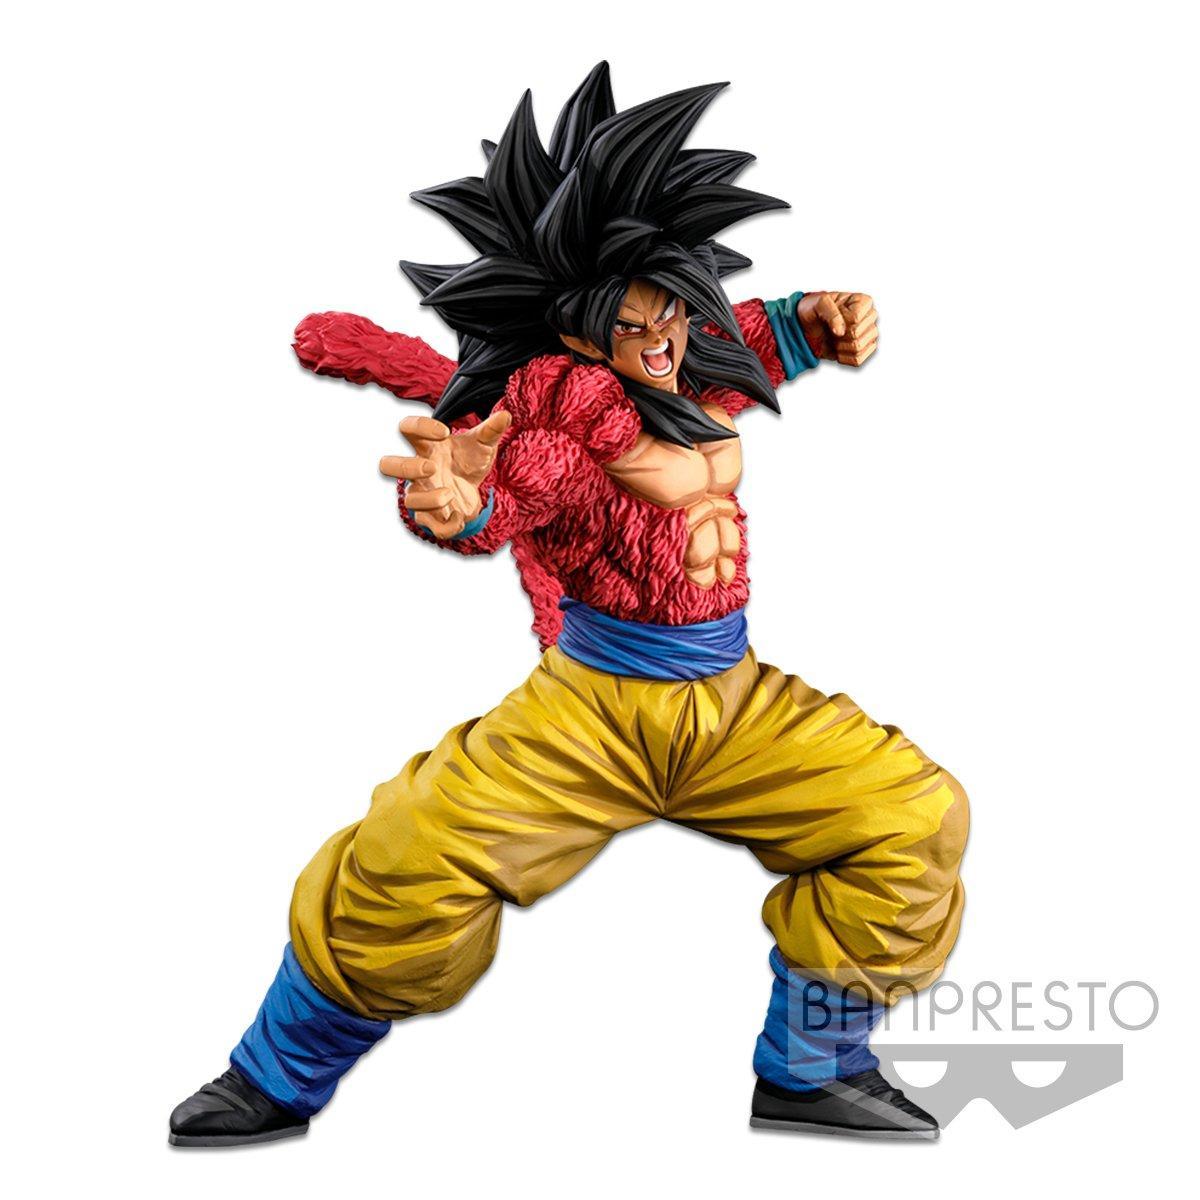 The son goku ssj4 super master stars piece x bwfc manga dimensions 1